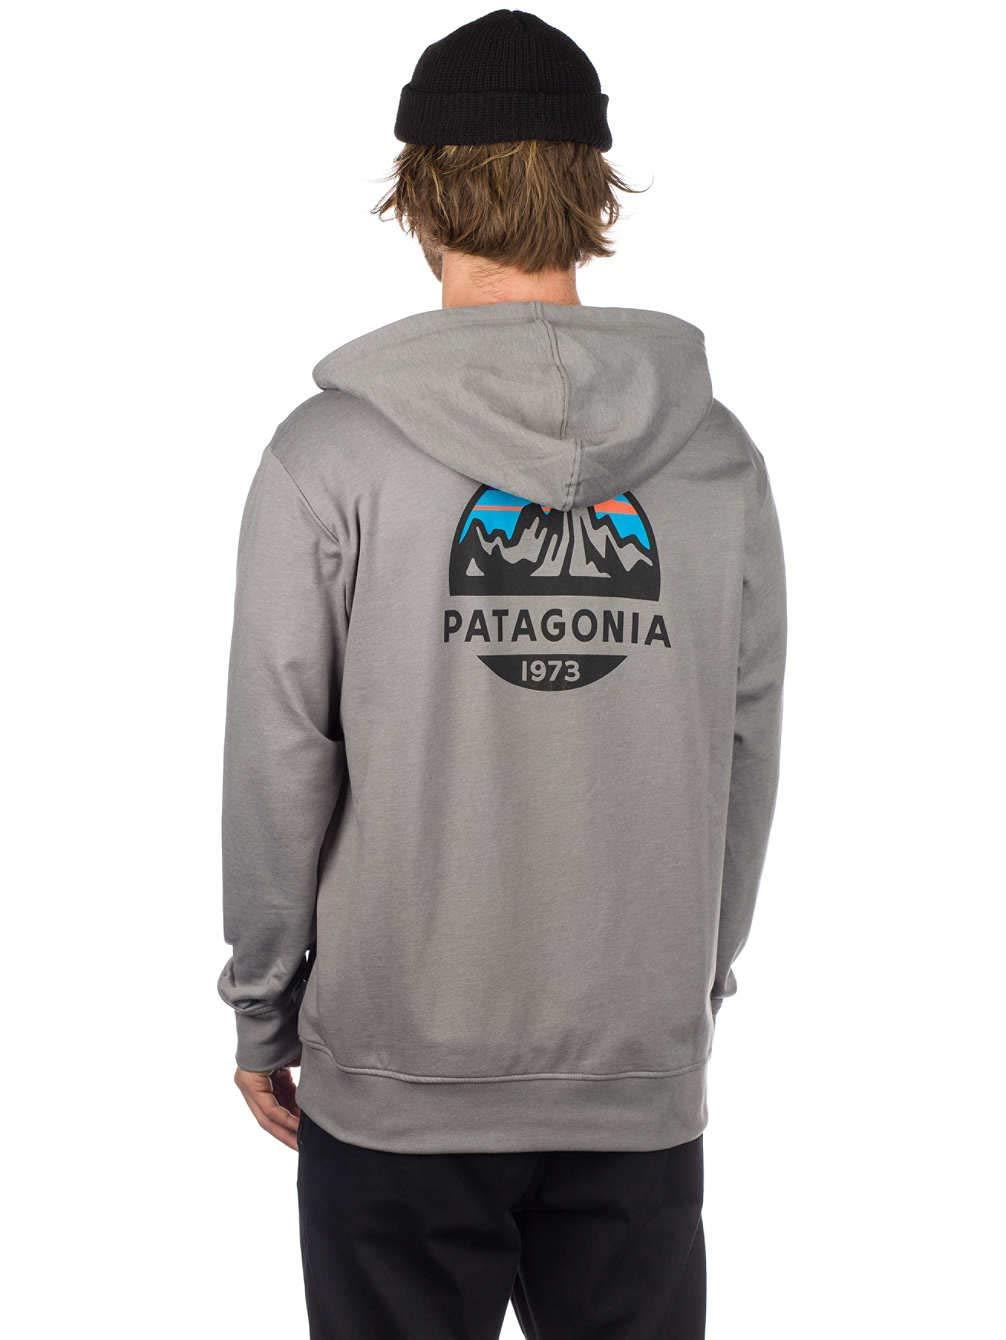 Patagonia Fitz Roy Scope LW Full-Zip